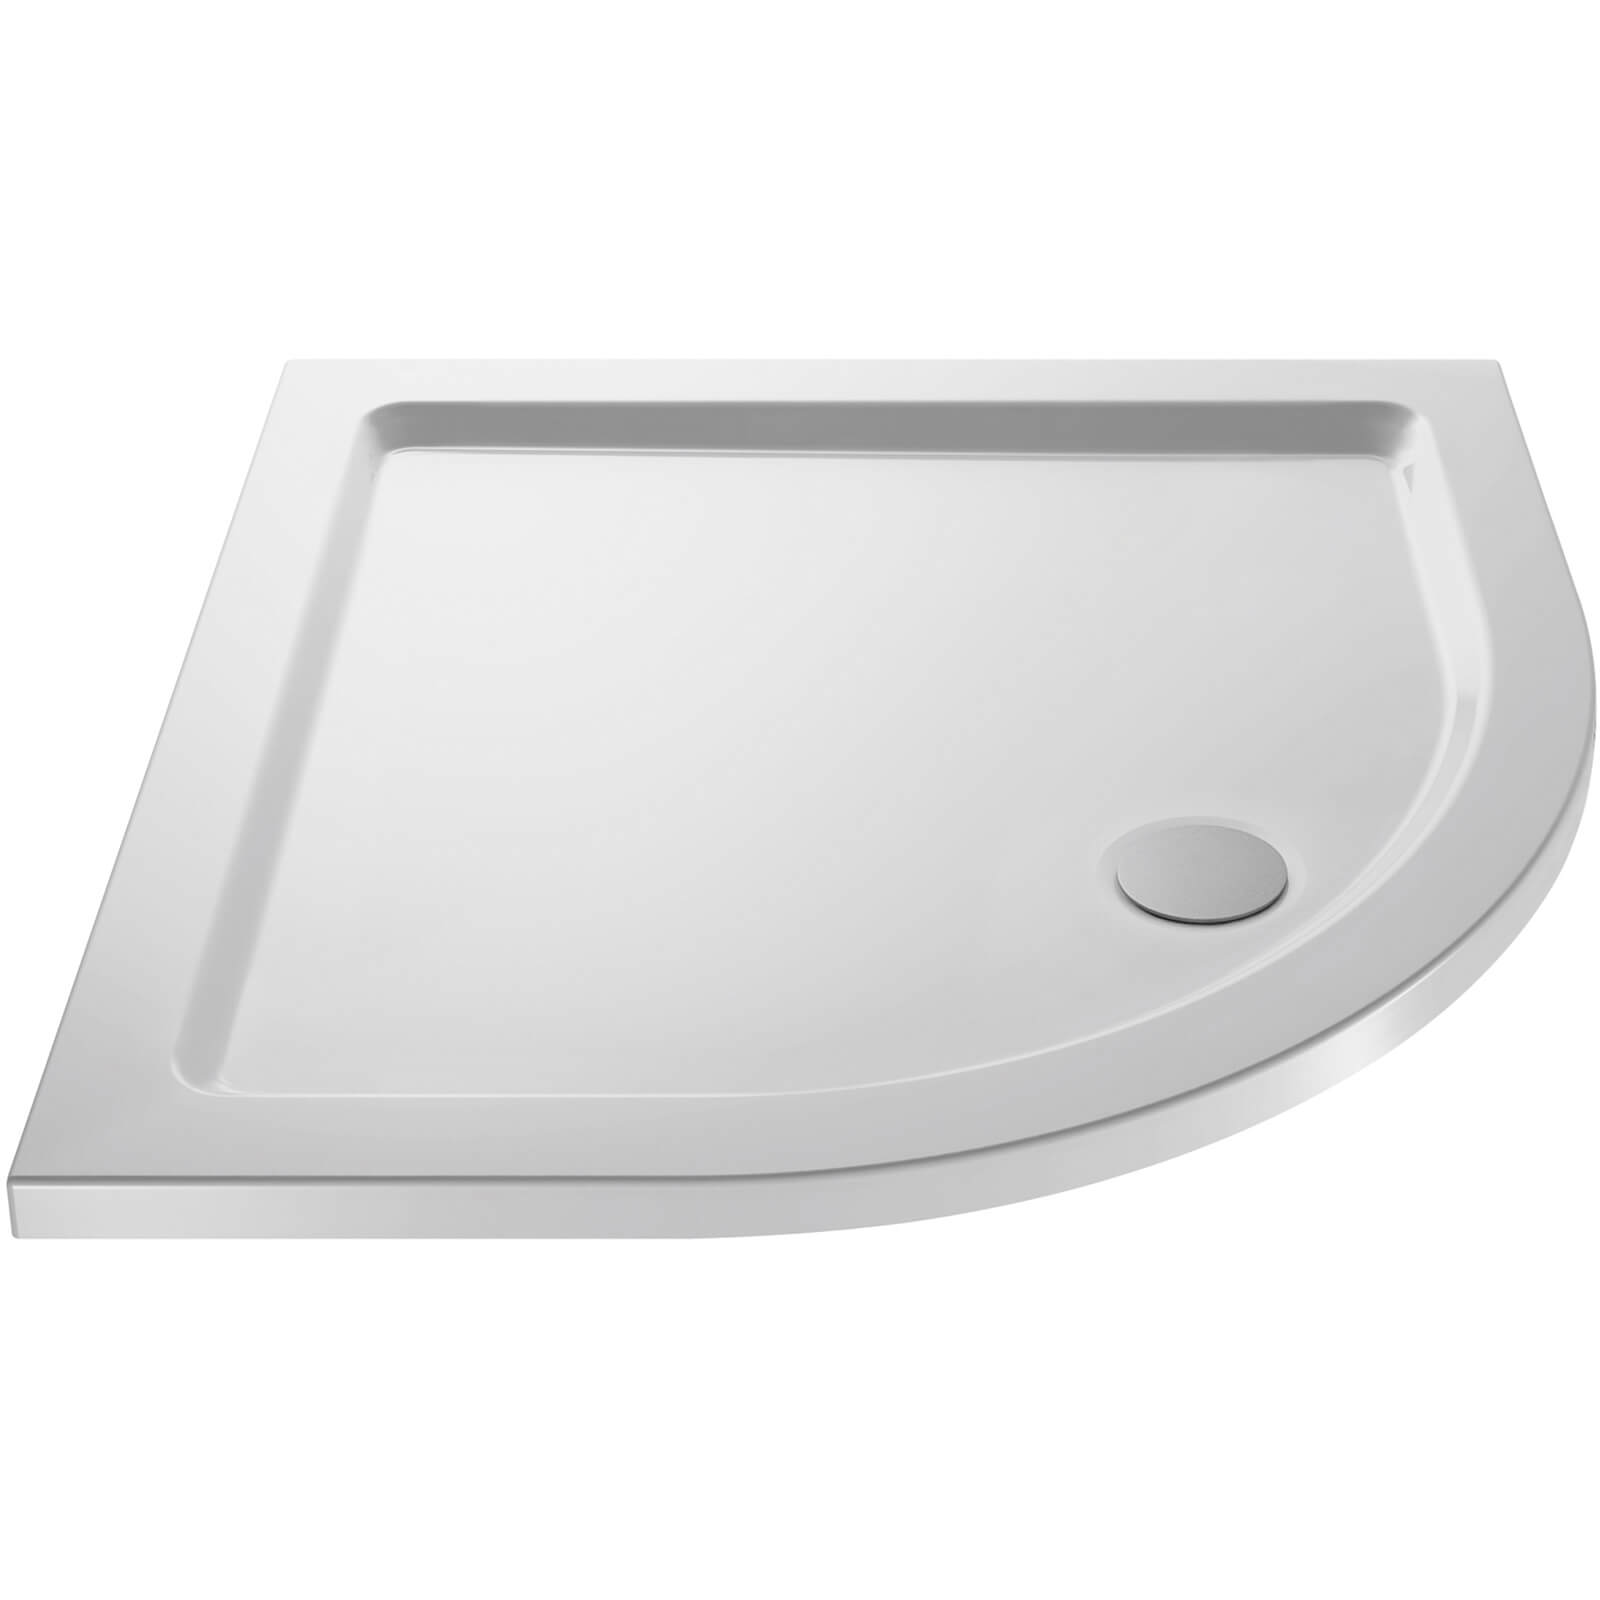 Balterley Quadrant Shower Tray - 700 x 700mm